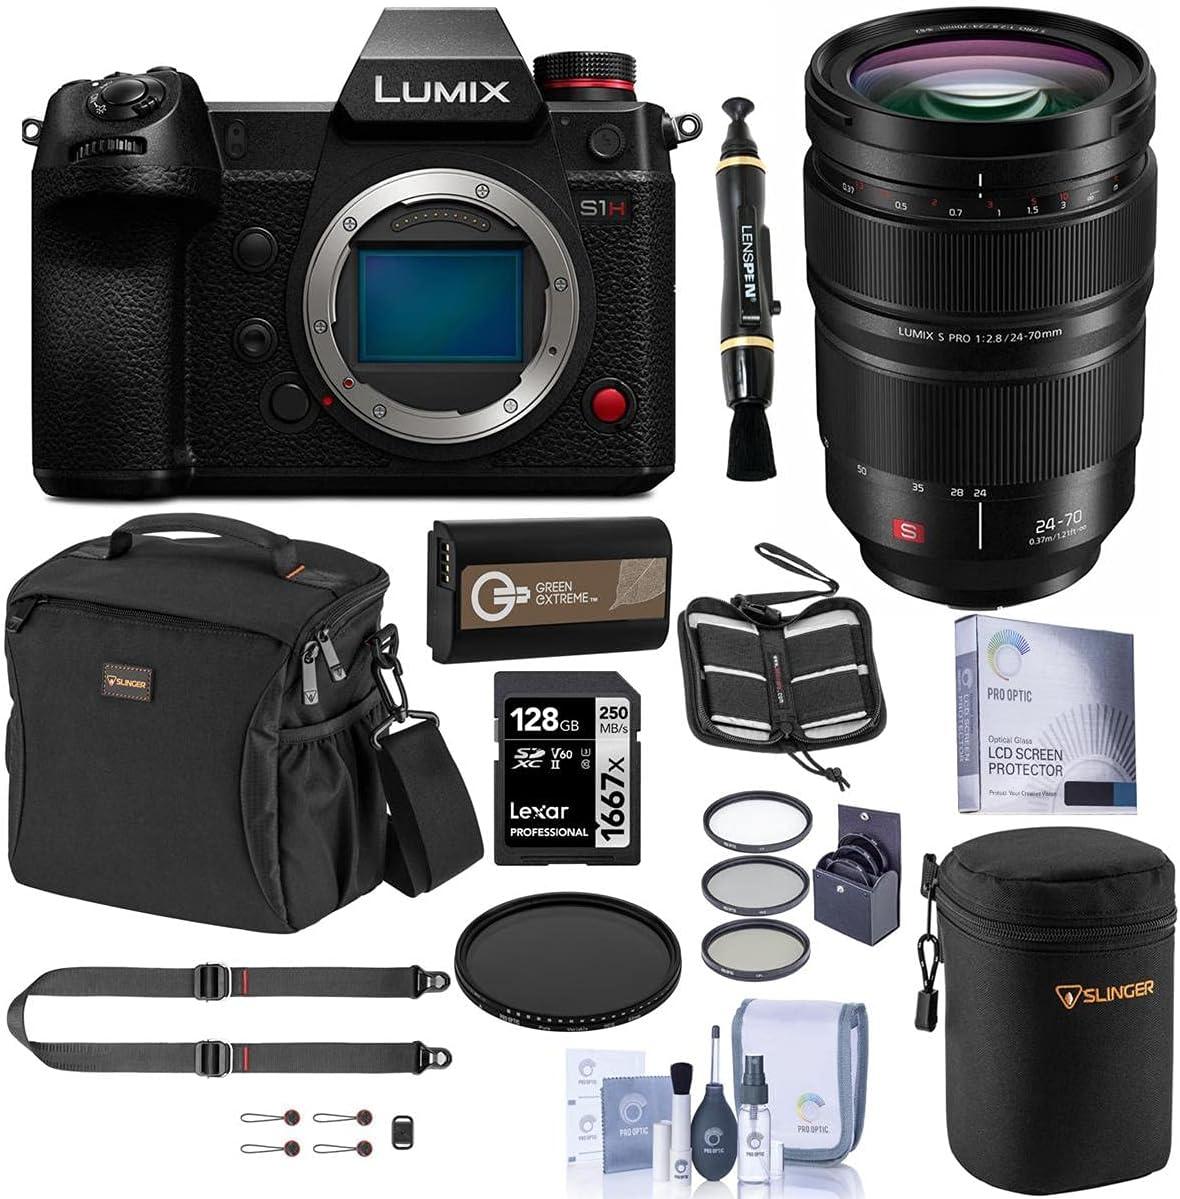 Panasonic Lumix DC-S1H Department store Mirrorless Camera with 24-70mm wholesale 2. PRO F S